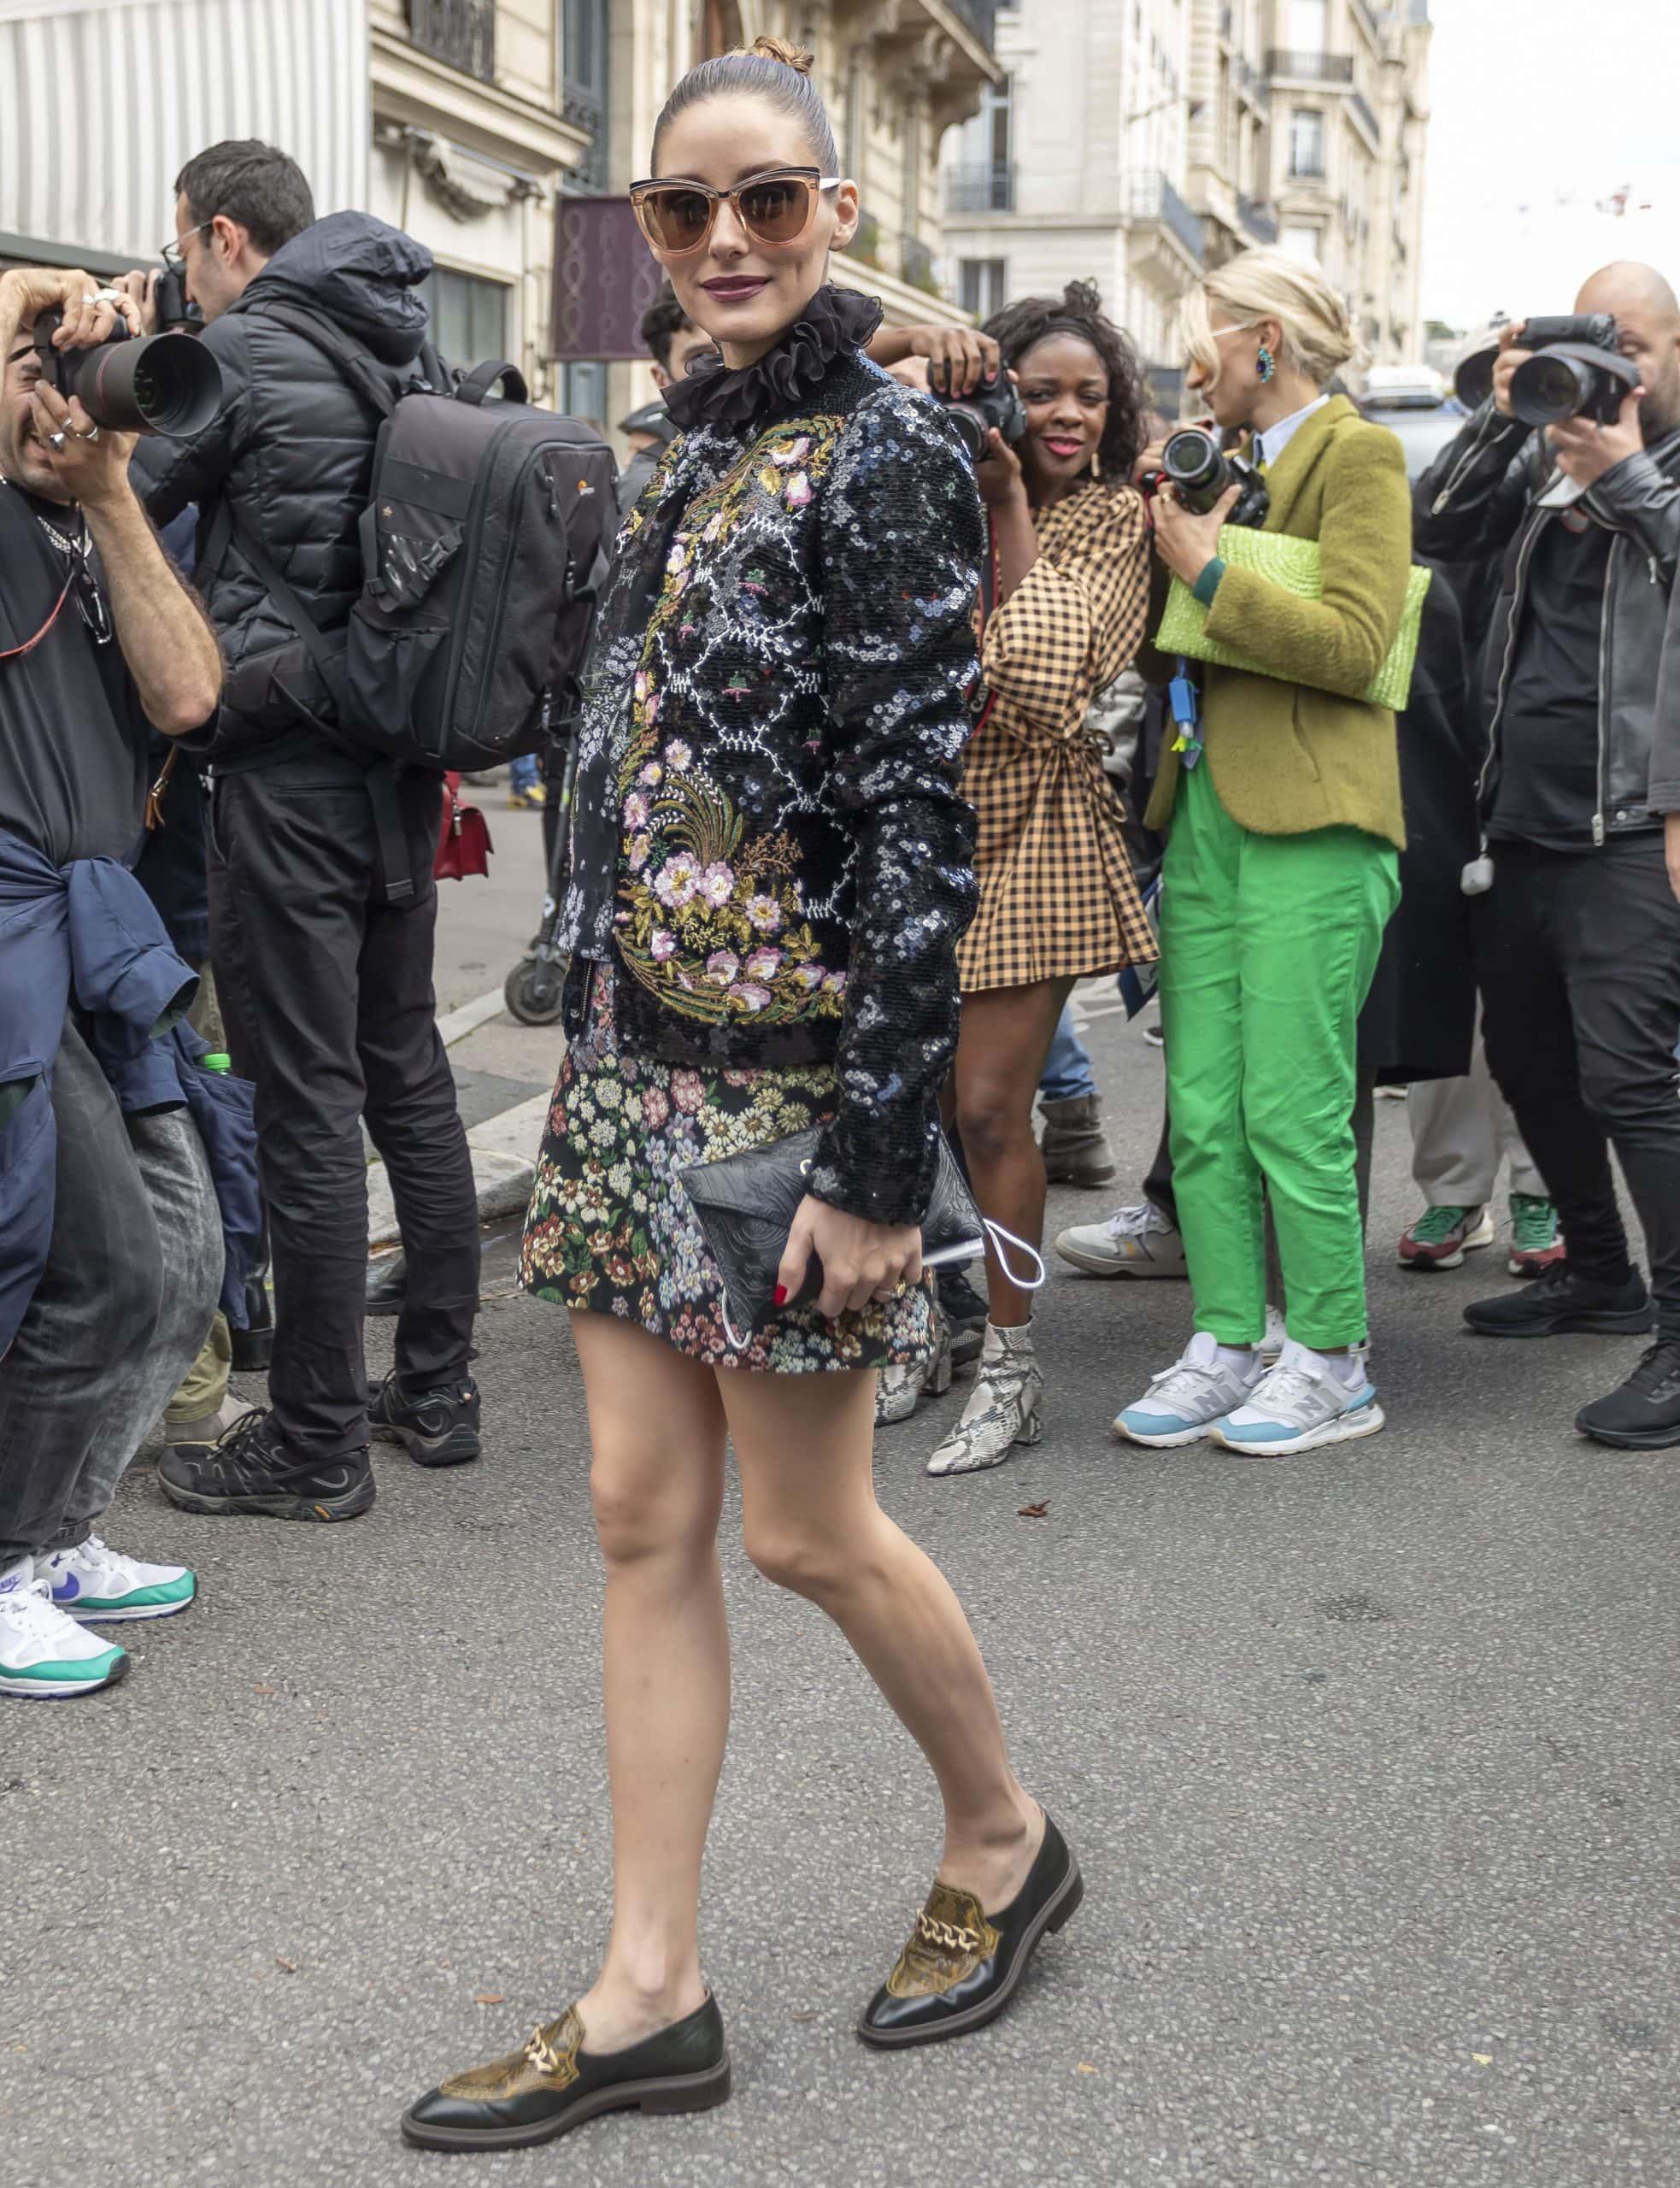 Olivia Palermo at the Giambattista Valli Womenswear Spring/Summer 2022 runway show during Paris Fashion Week on October 4, 2021